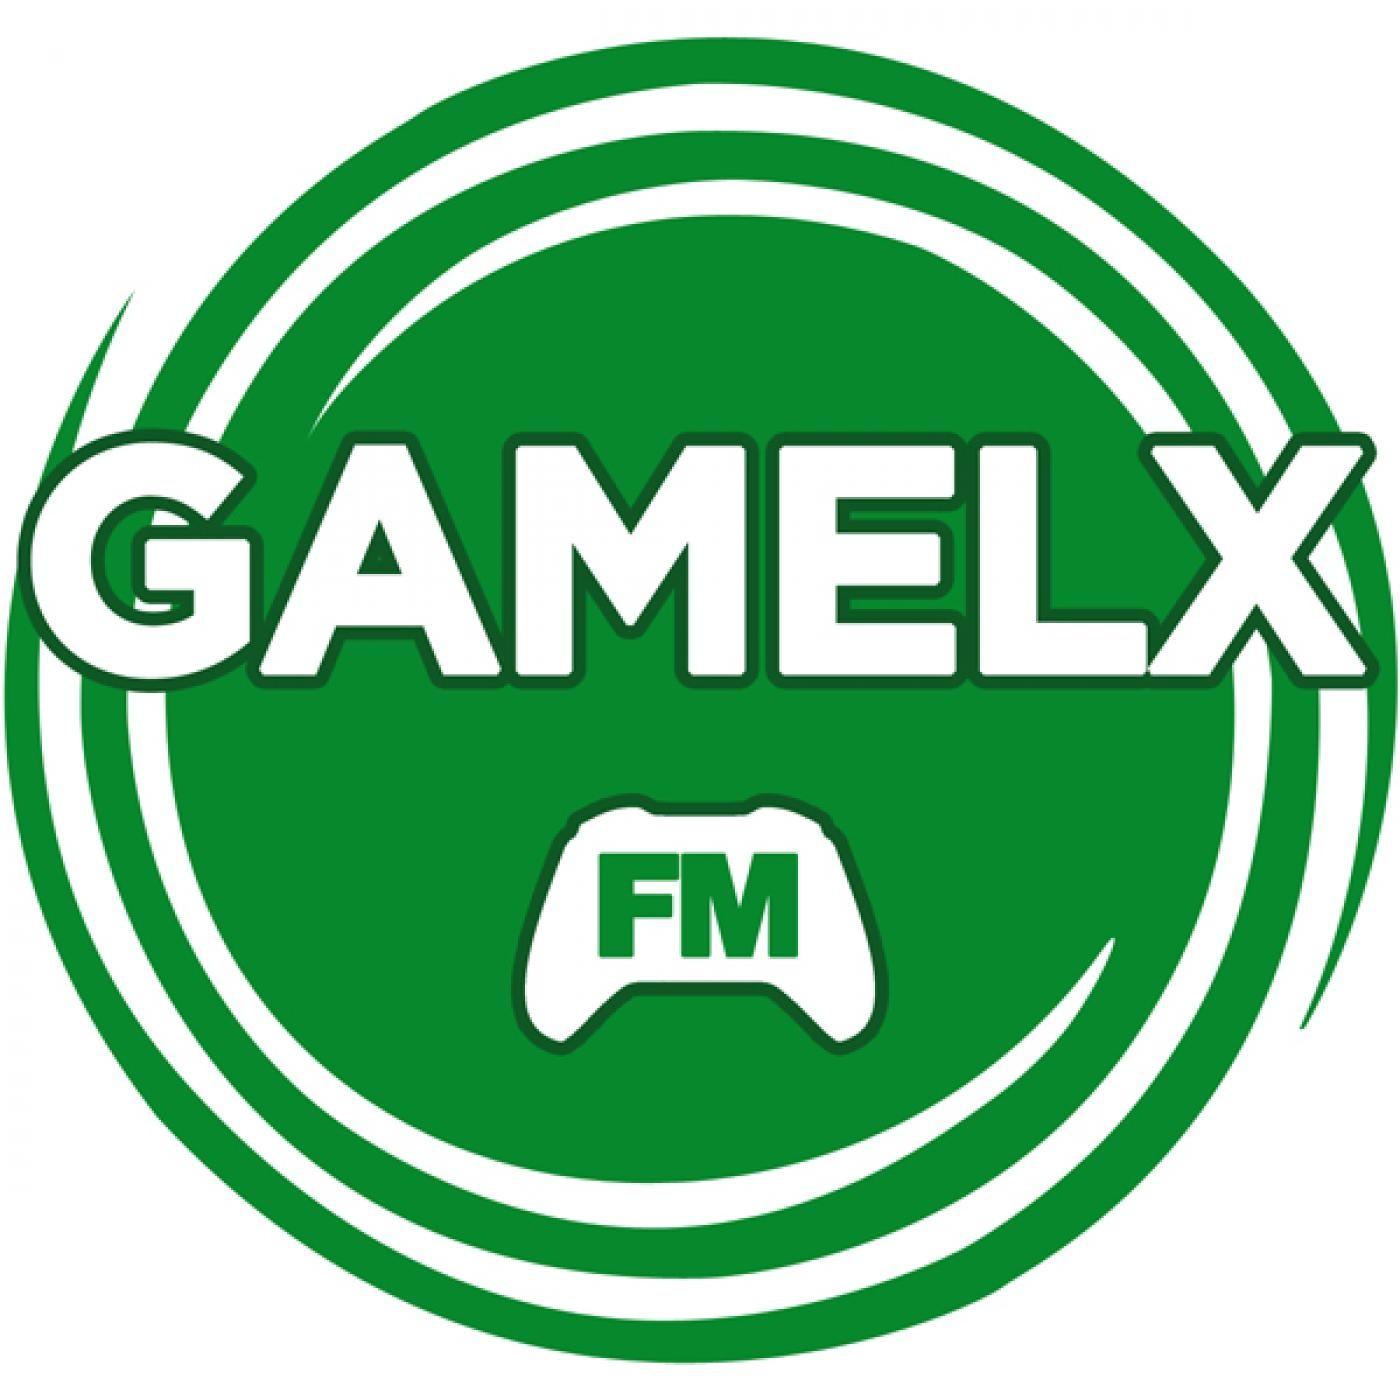 <![CDATA[GAMELX Podcast]]>